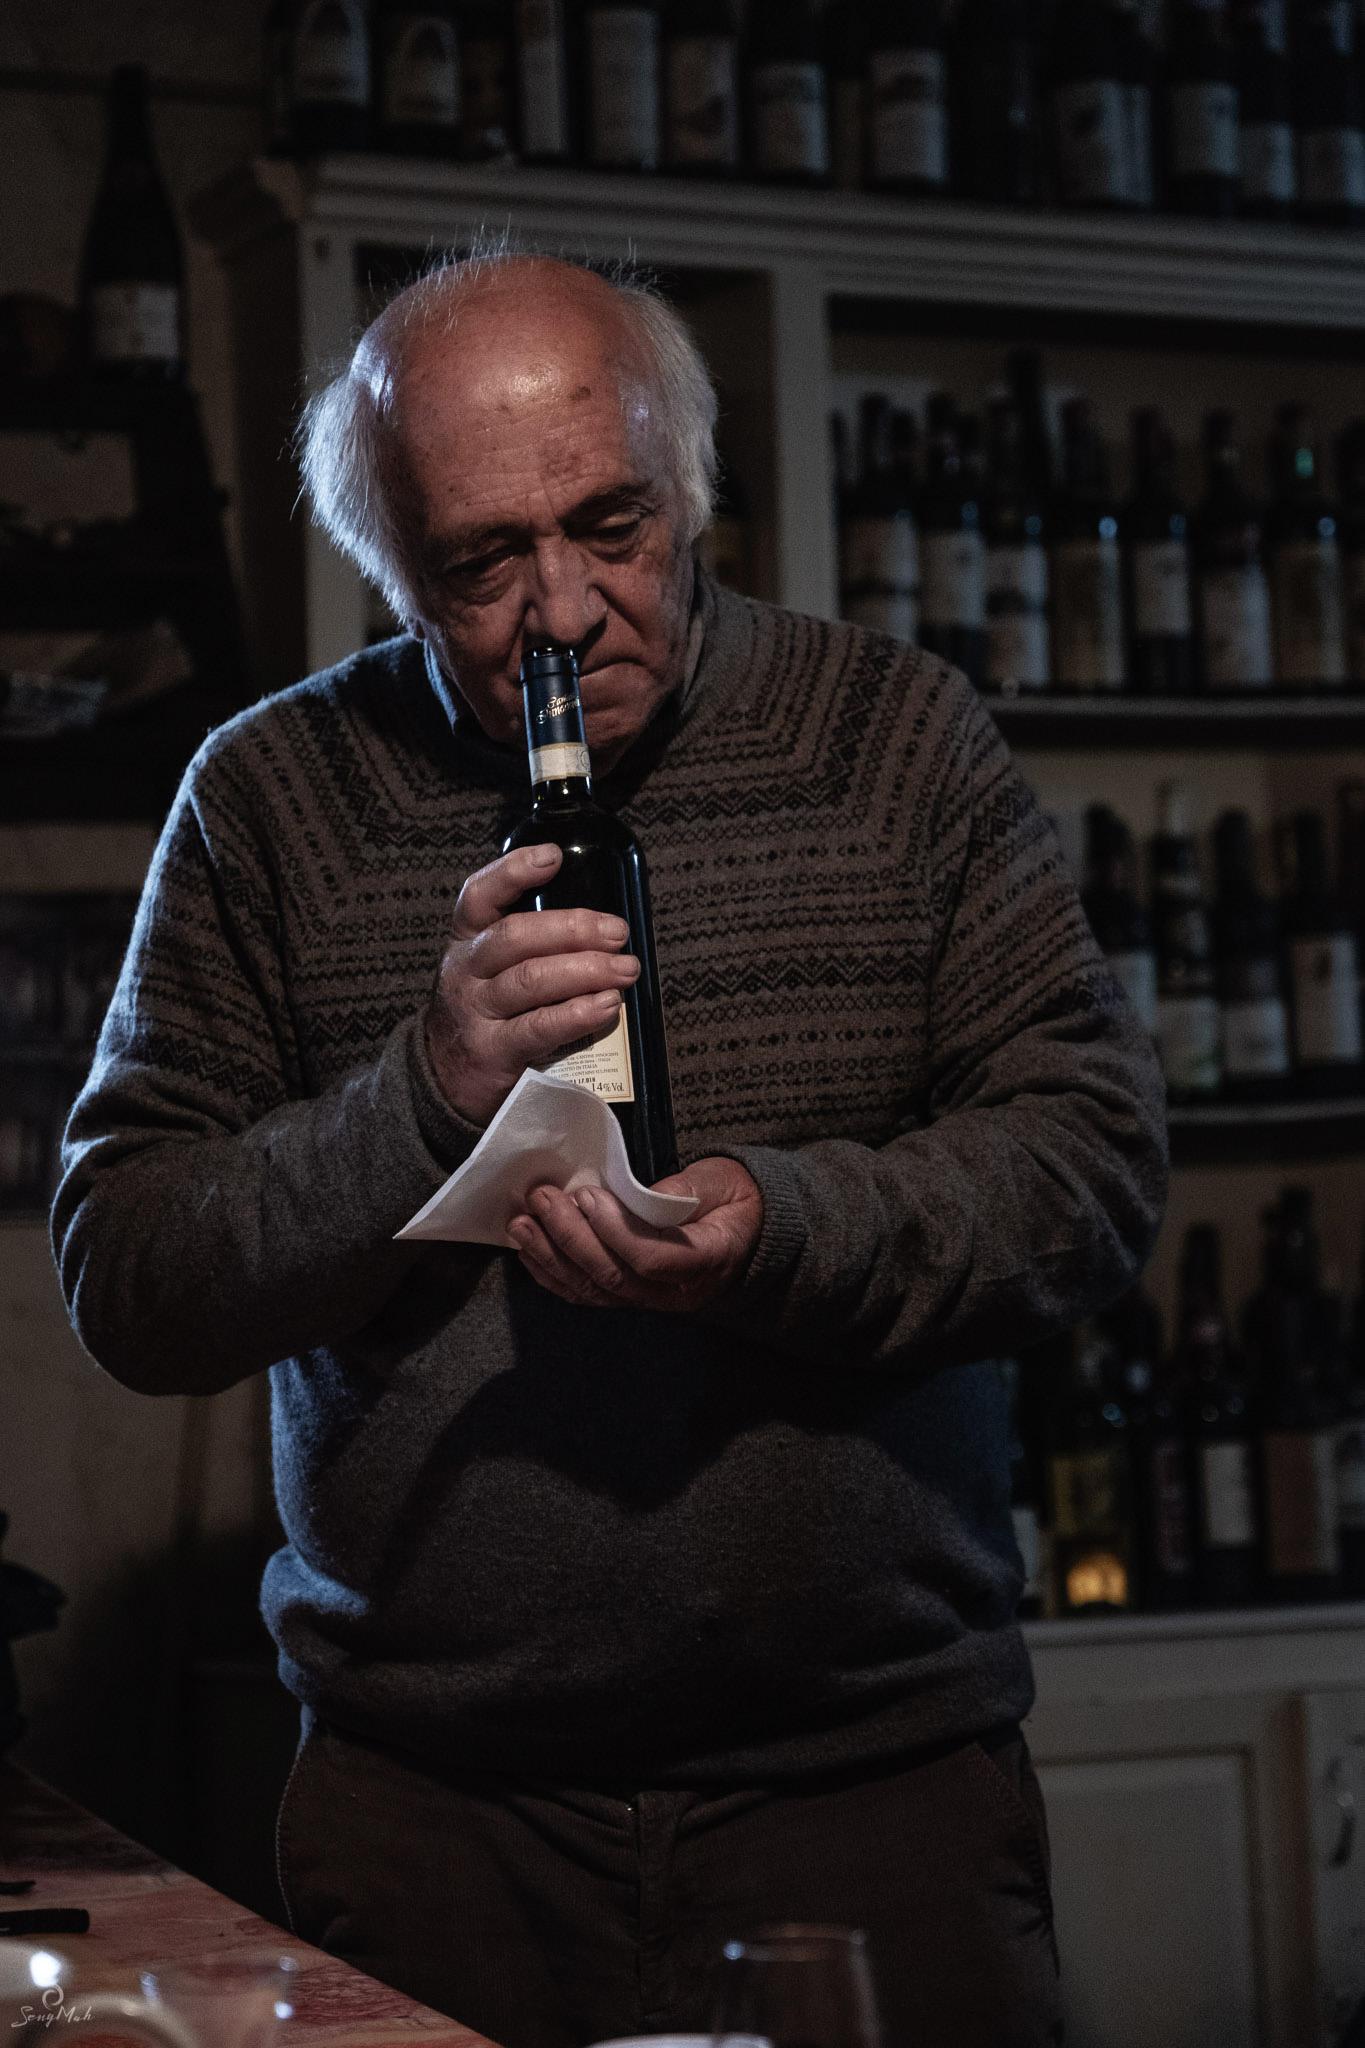 Wine tasting in a wine cellar, Montefollonico